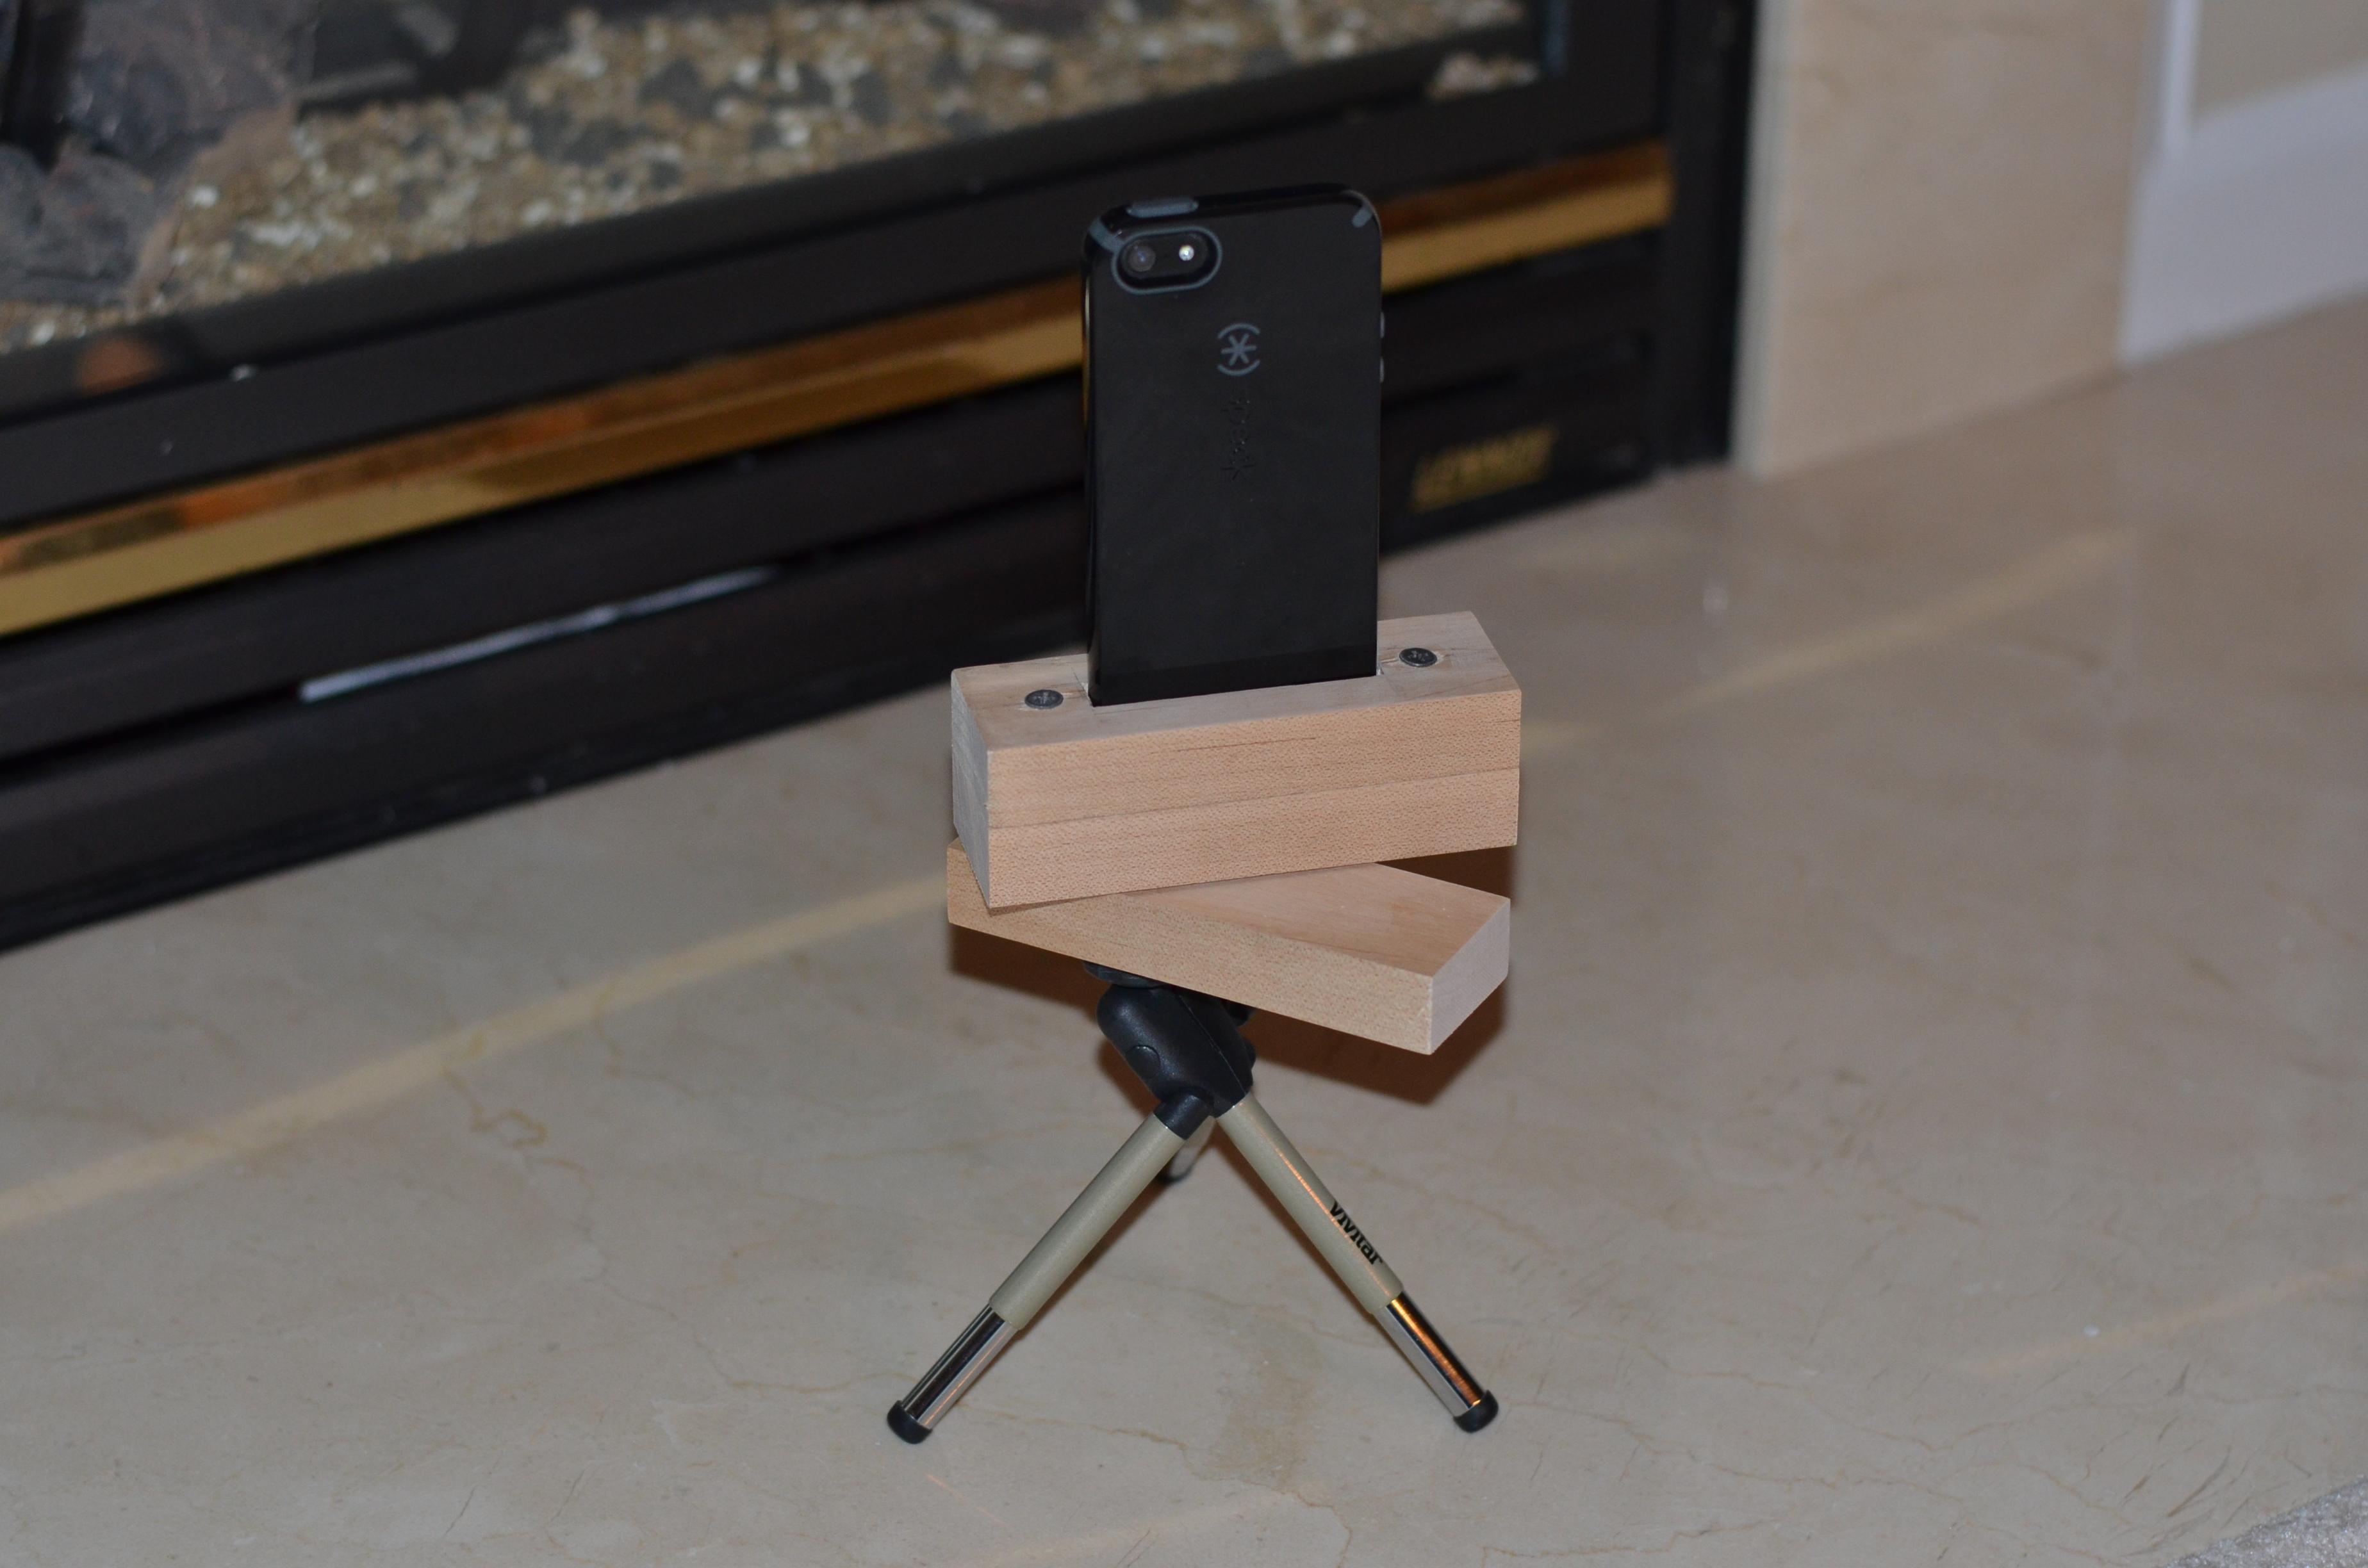 DIY iPhone 5 Panorama Tripod Mount